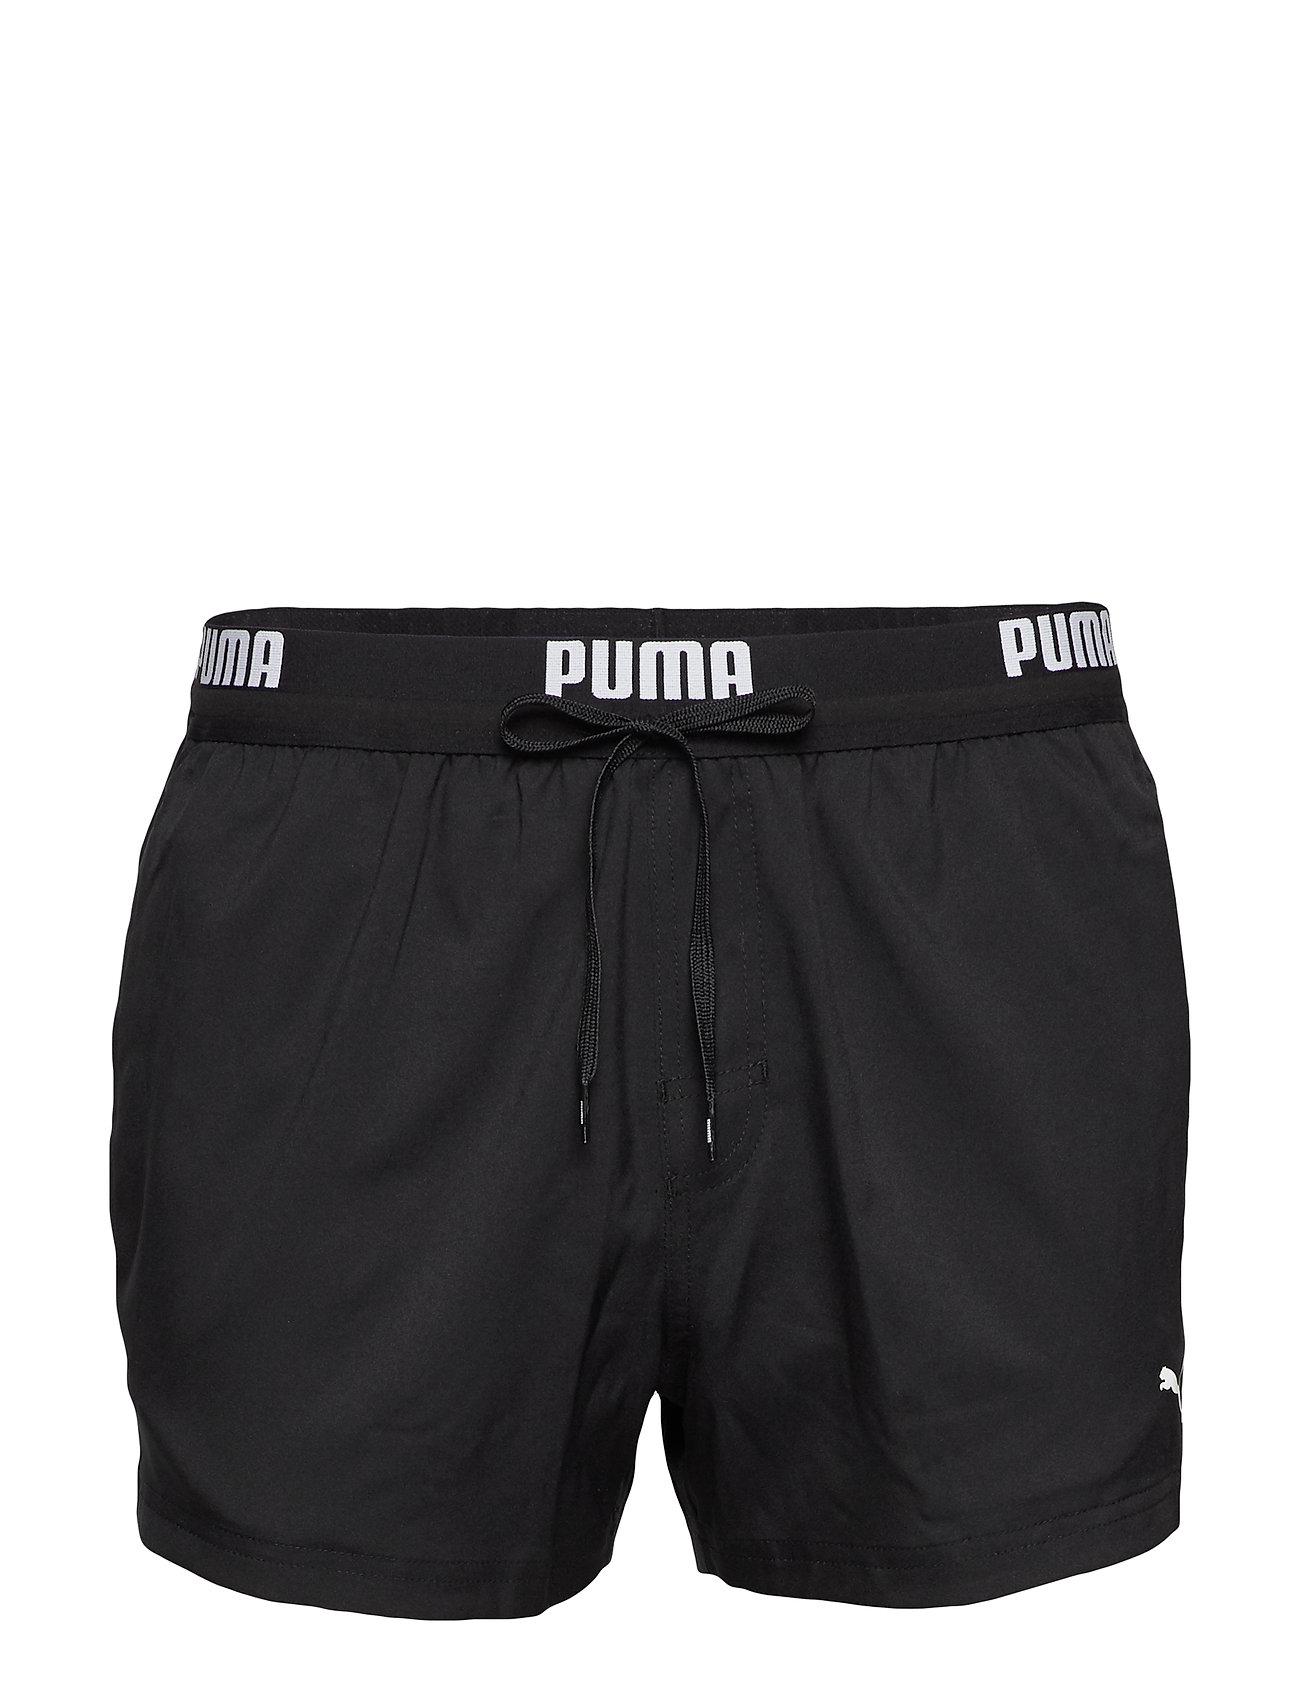 Image of Puma Swim Men Logo Short Length Swi Badeshorts Sort Puma Swim (3362440489)